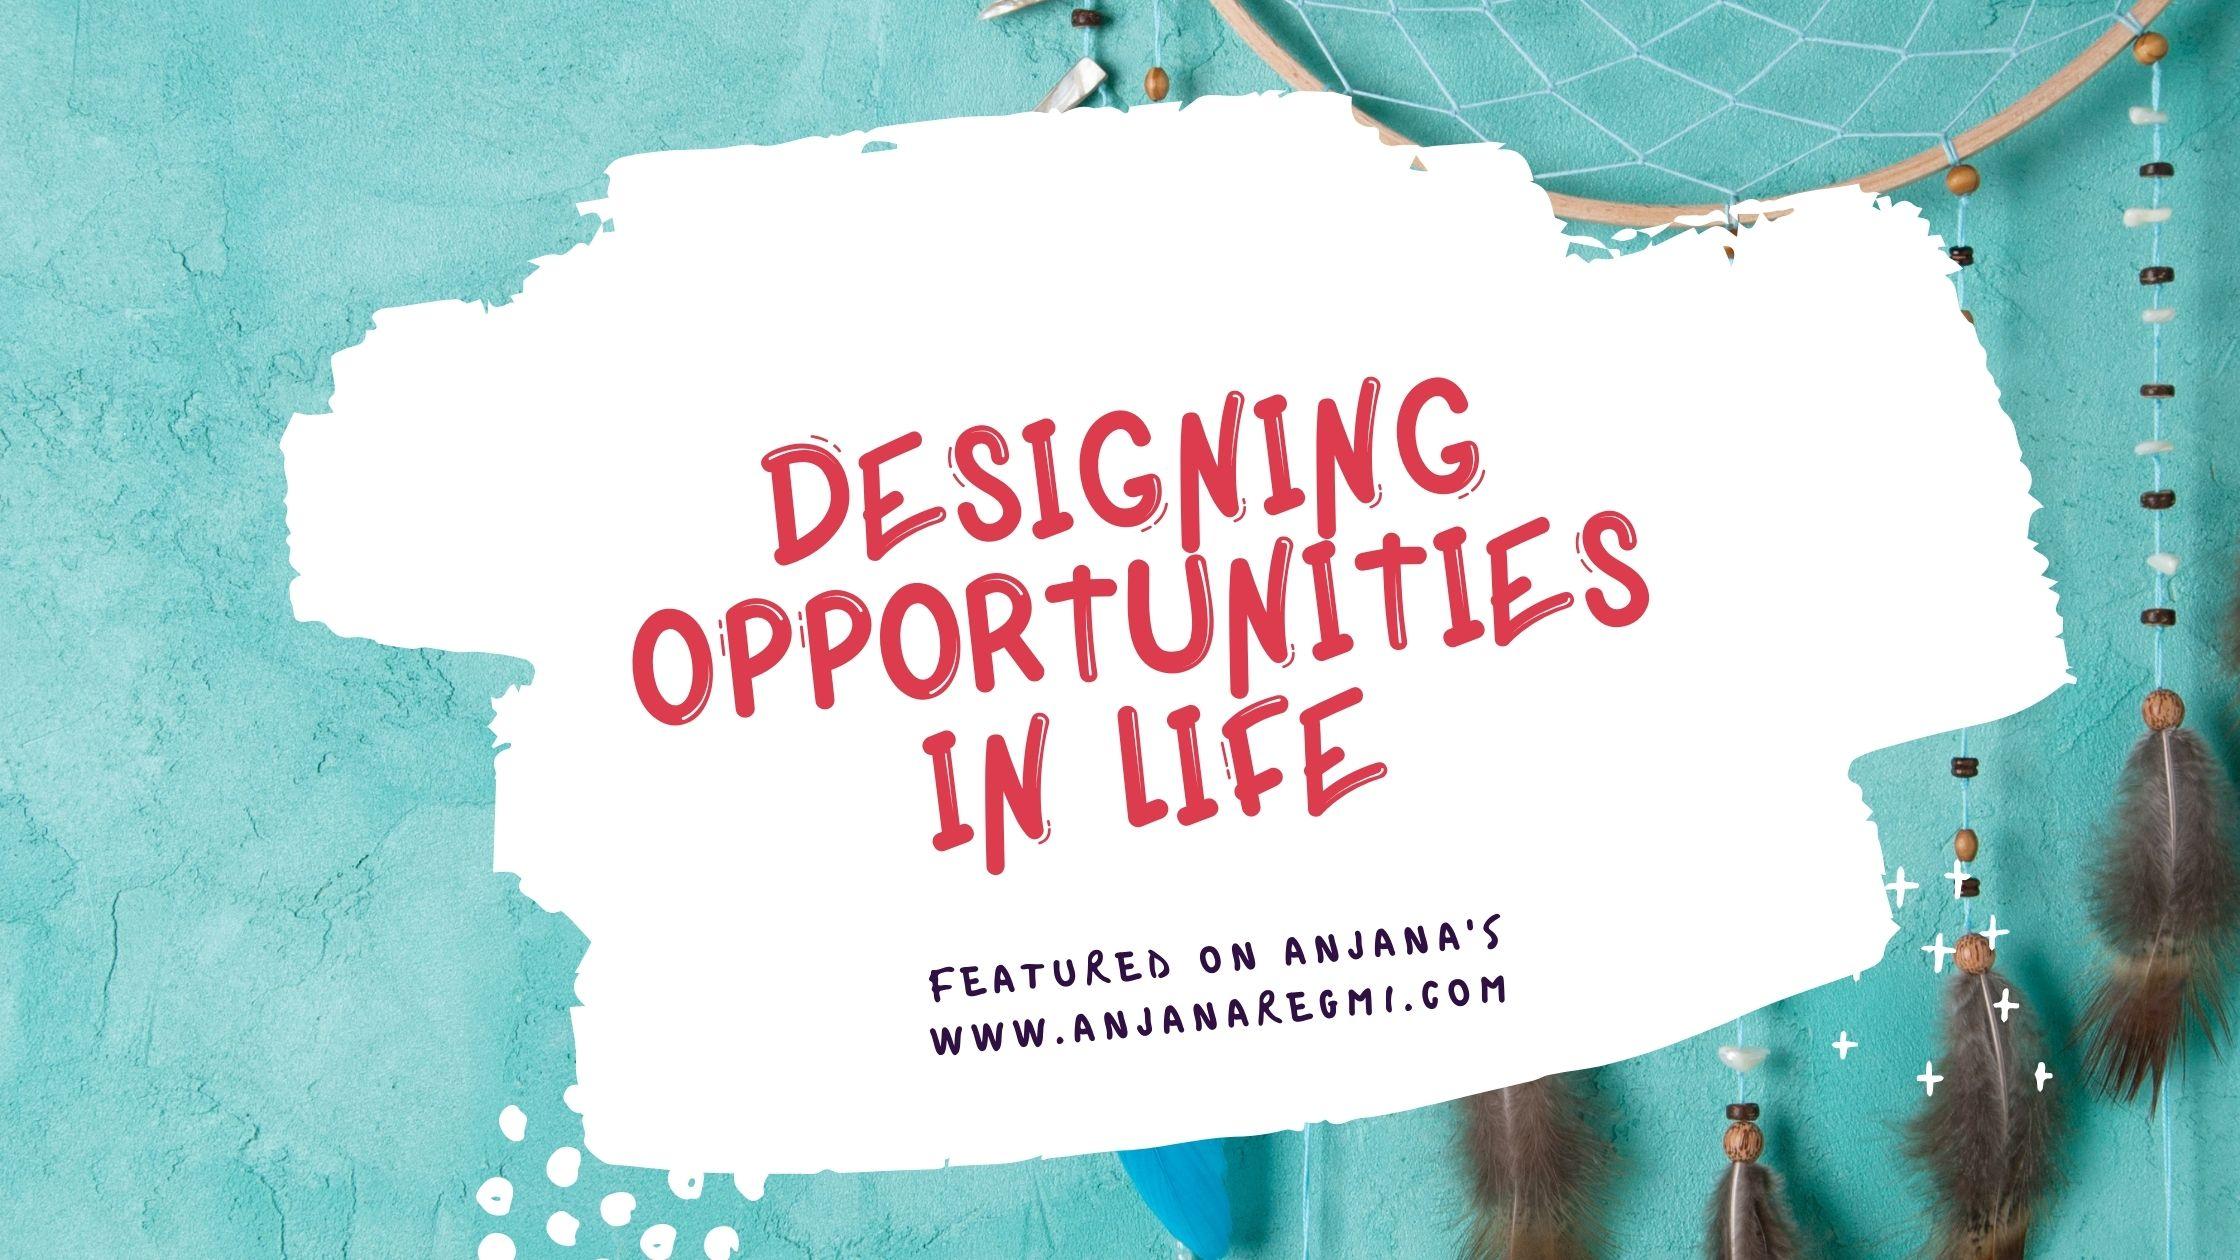 Designing opportunities in life